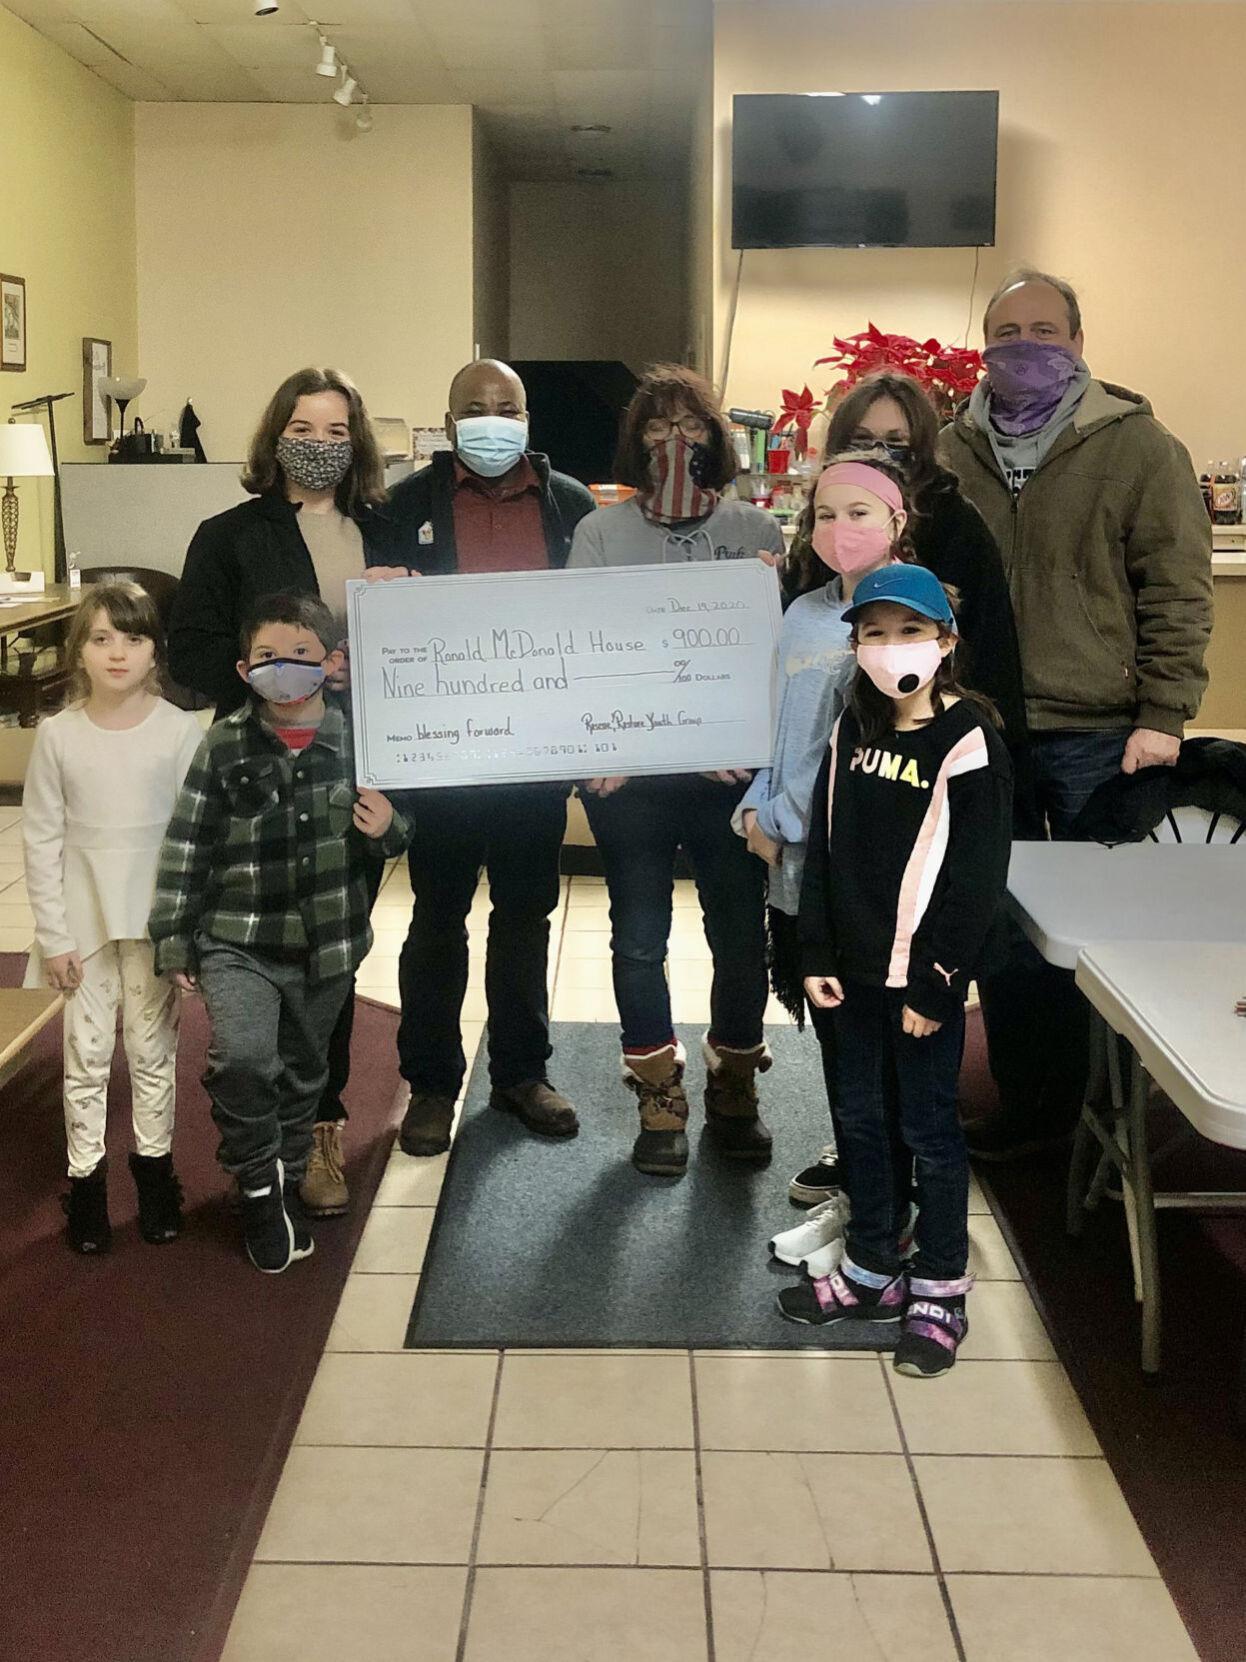 Youth group donates to Ronald McDonald House